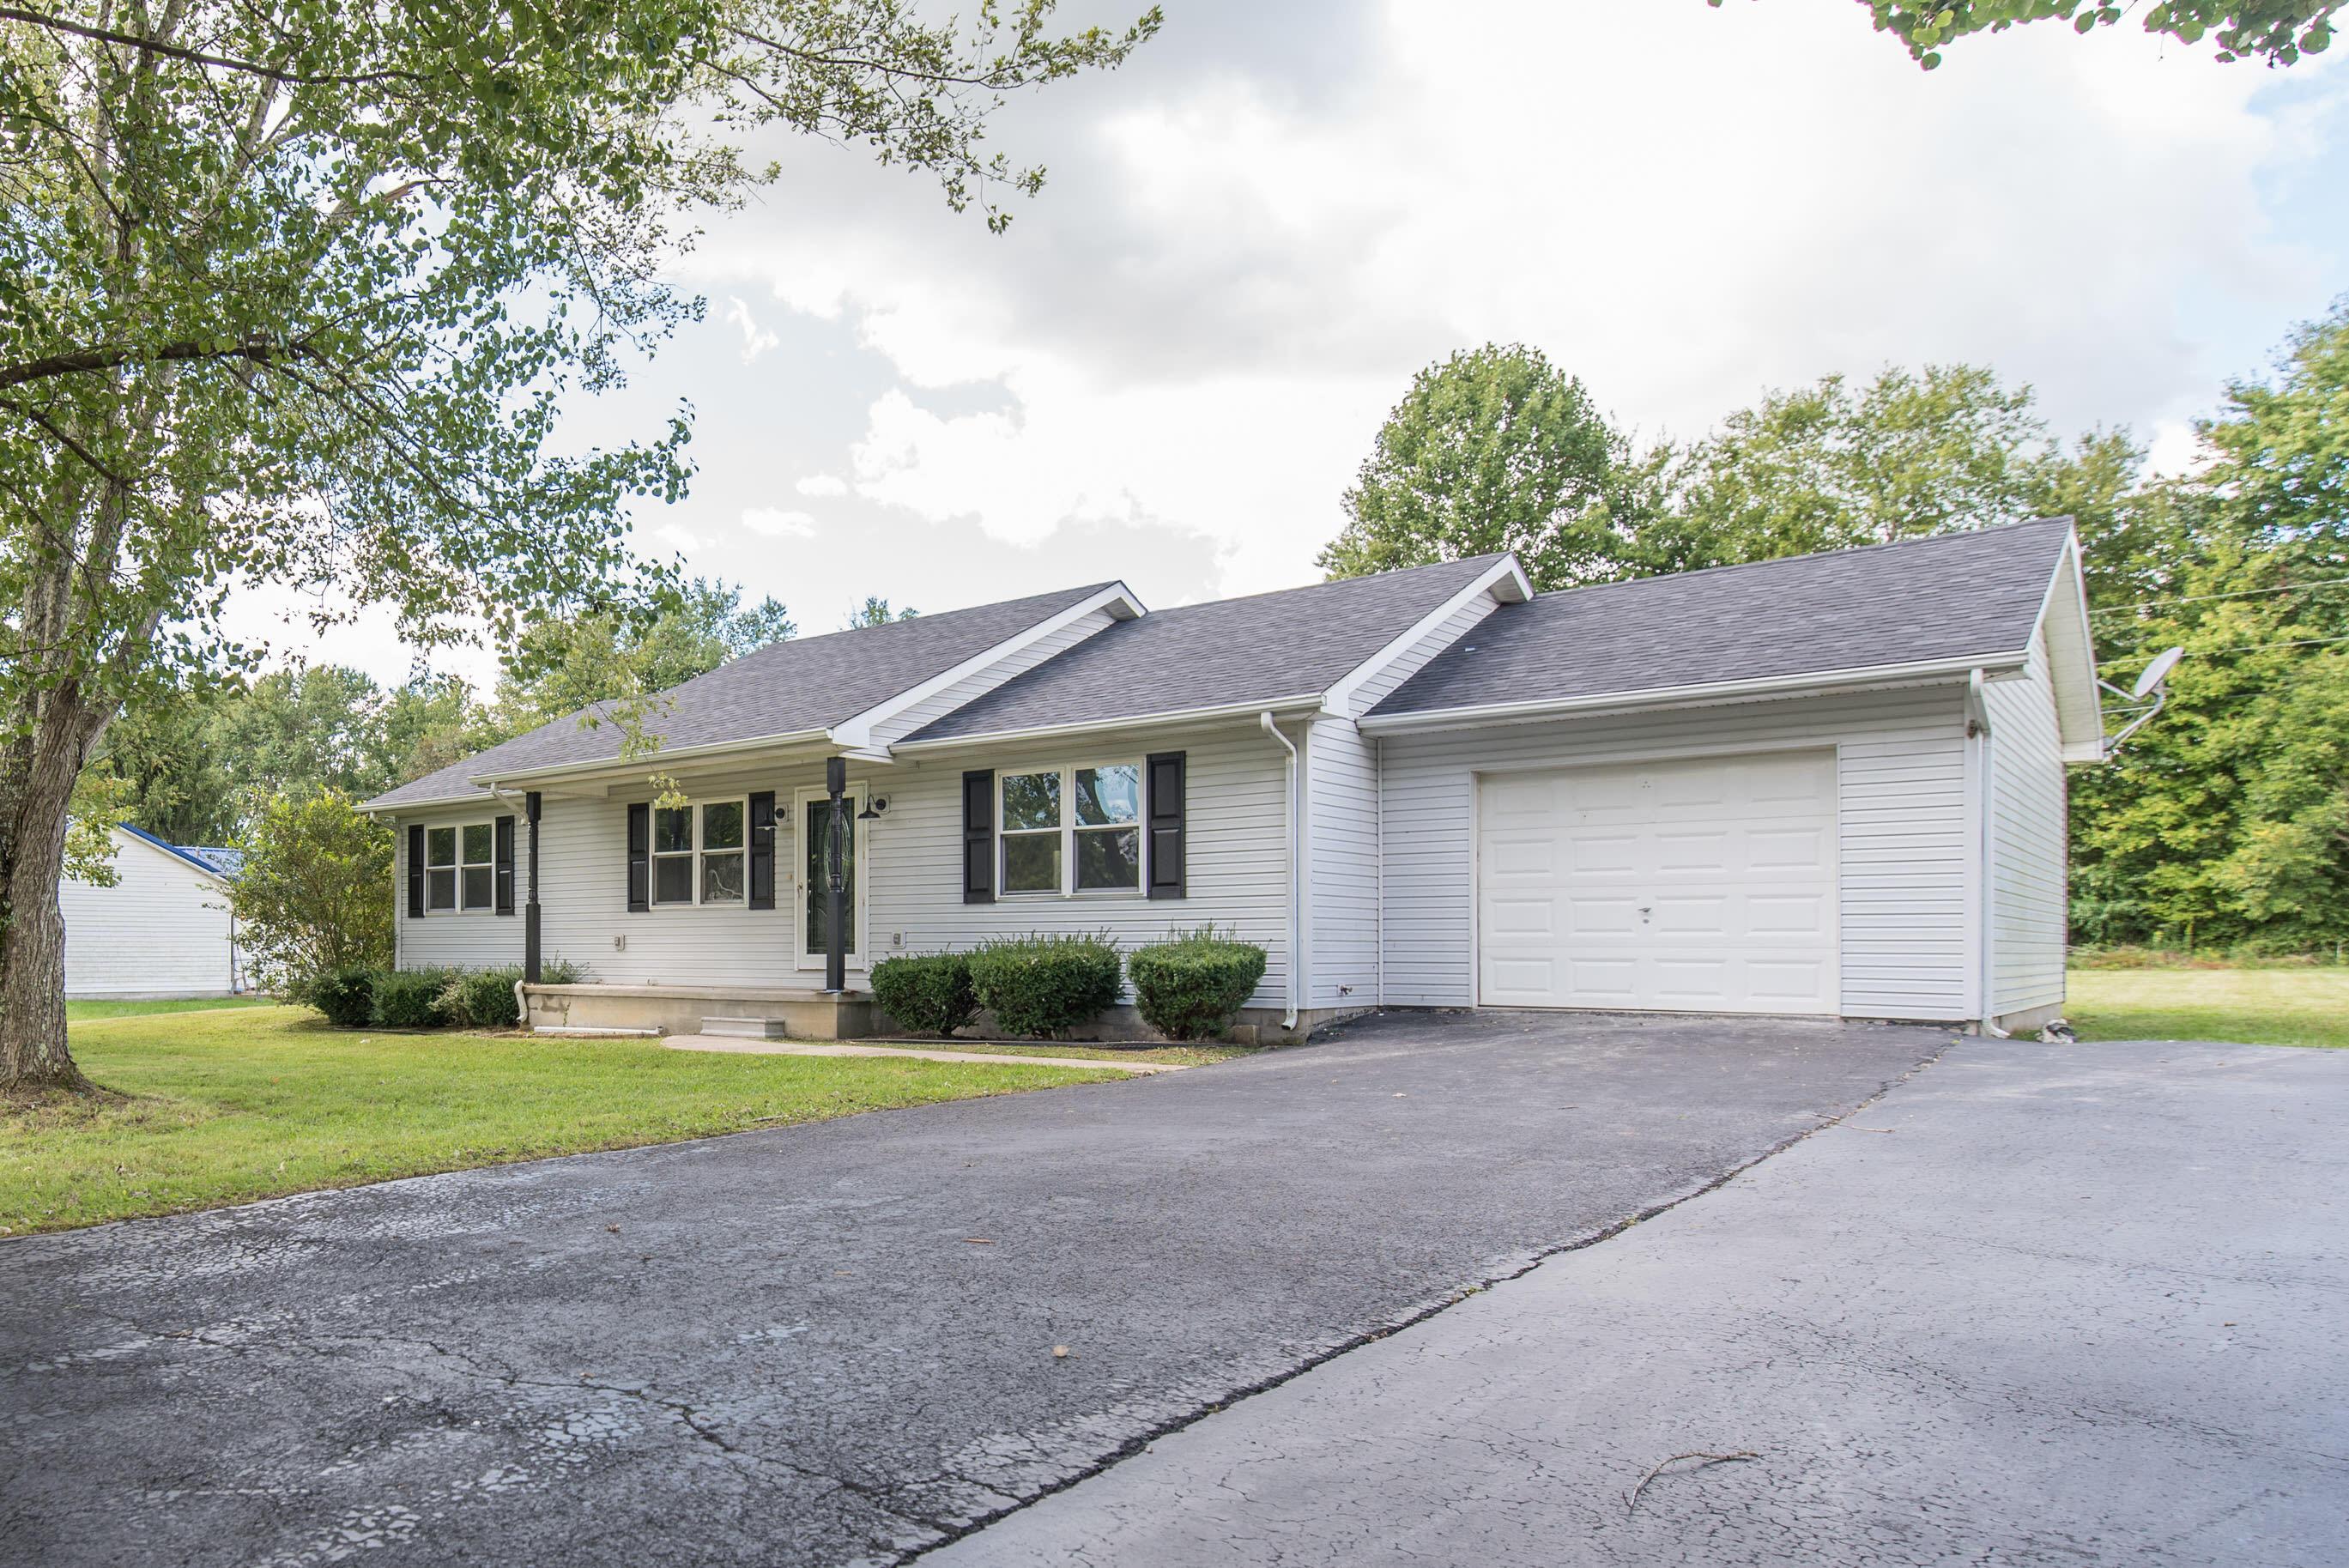 116 Blake Drive, Jeffersonville, Kentucky 40337, 3 Bedrooms Bedrooms, ,2 BathroomsBathrooms,Residential,For Sale,Blake,20120815